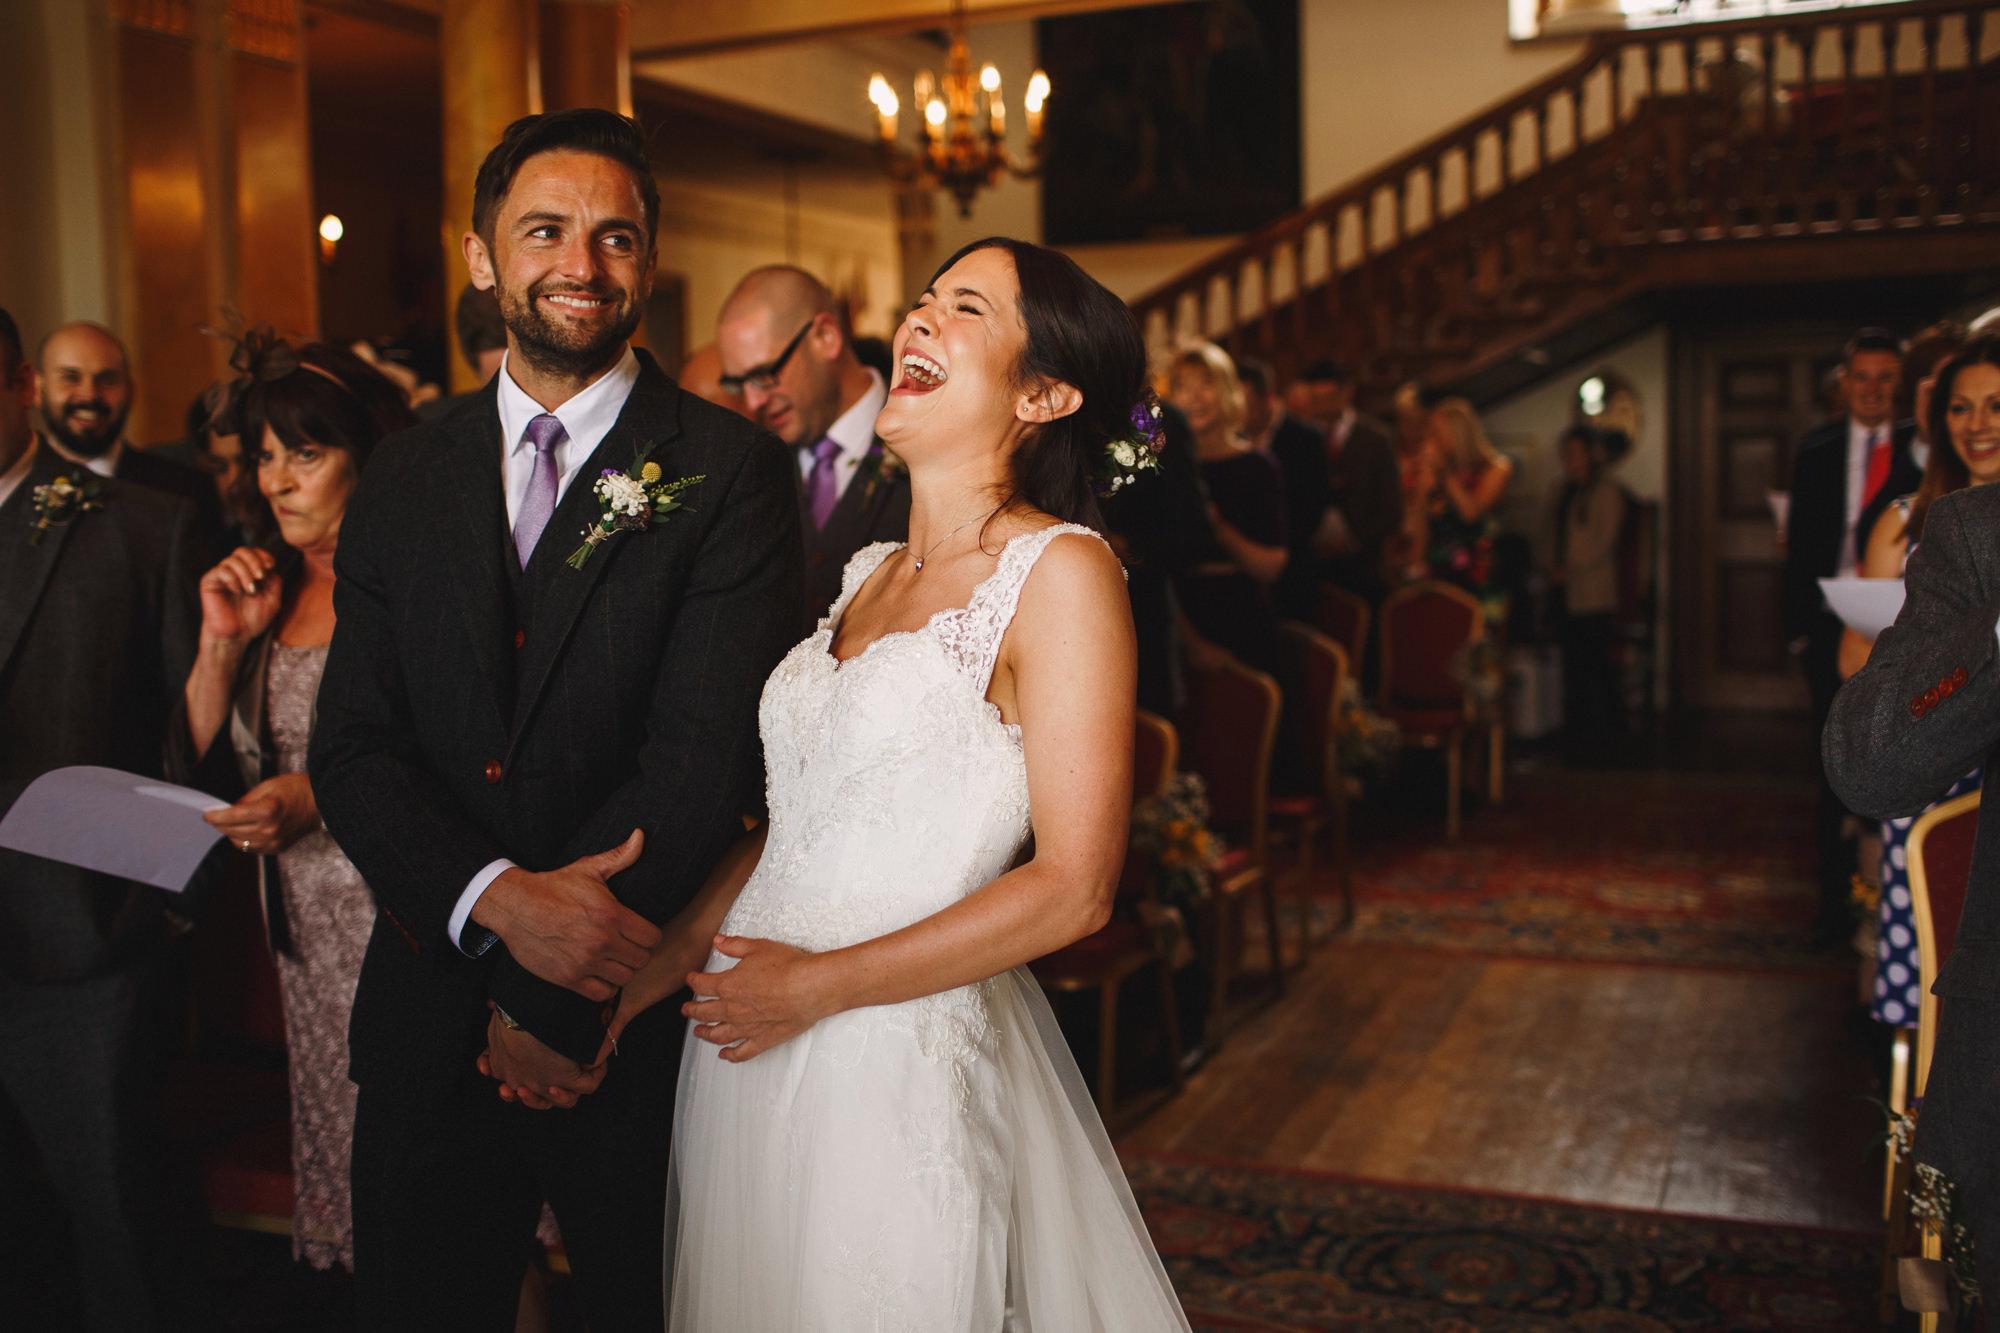 Walcot hall wedding photography shropshire 13